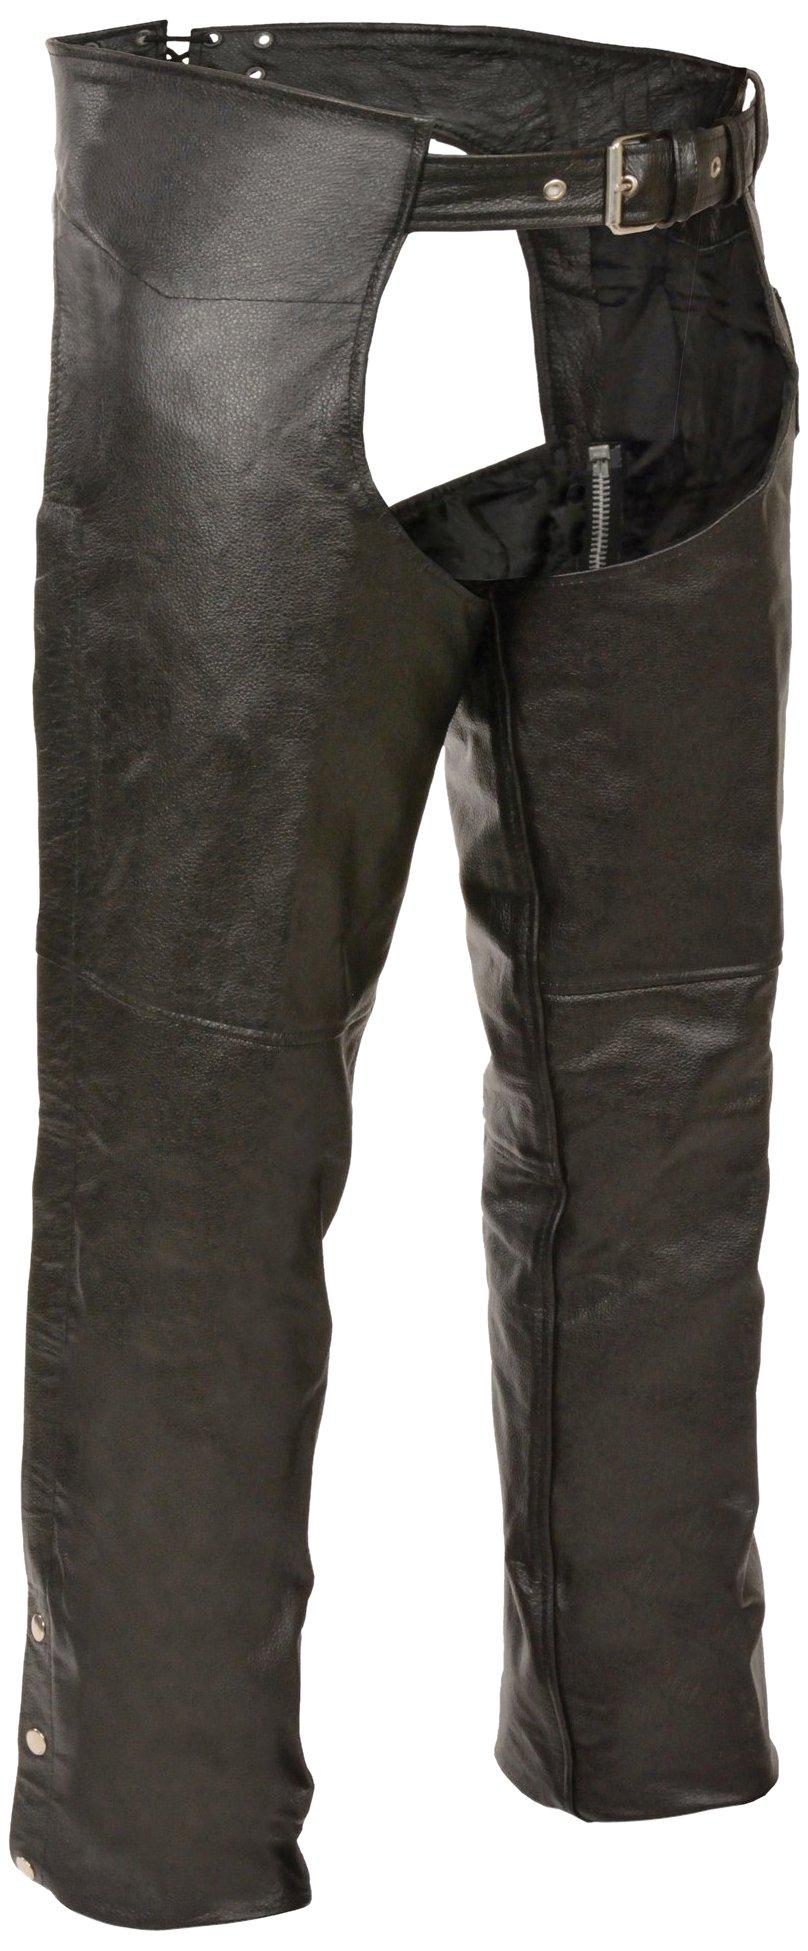 Event Biker Leather Basic Plain Lined Chaps (Black, 4X-Large)